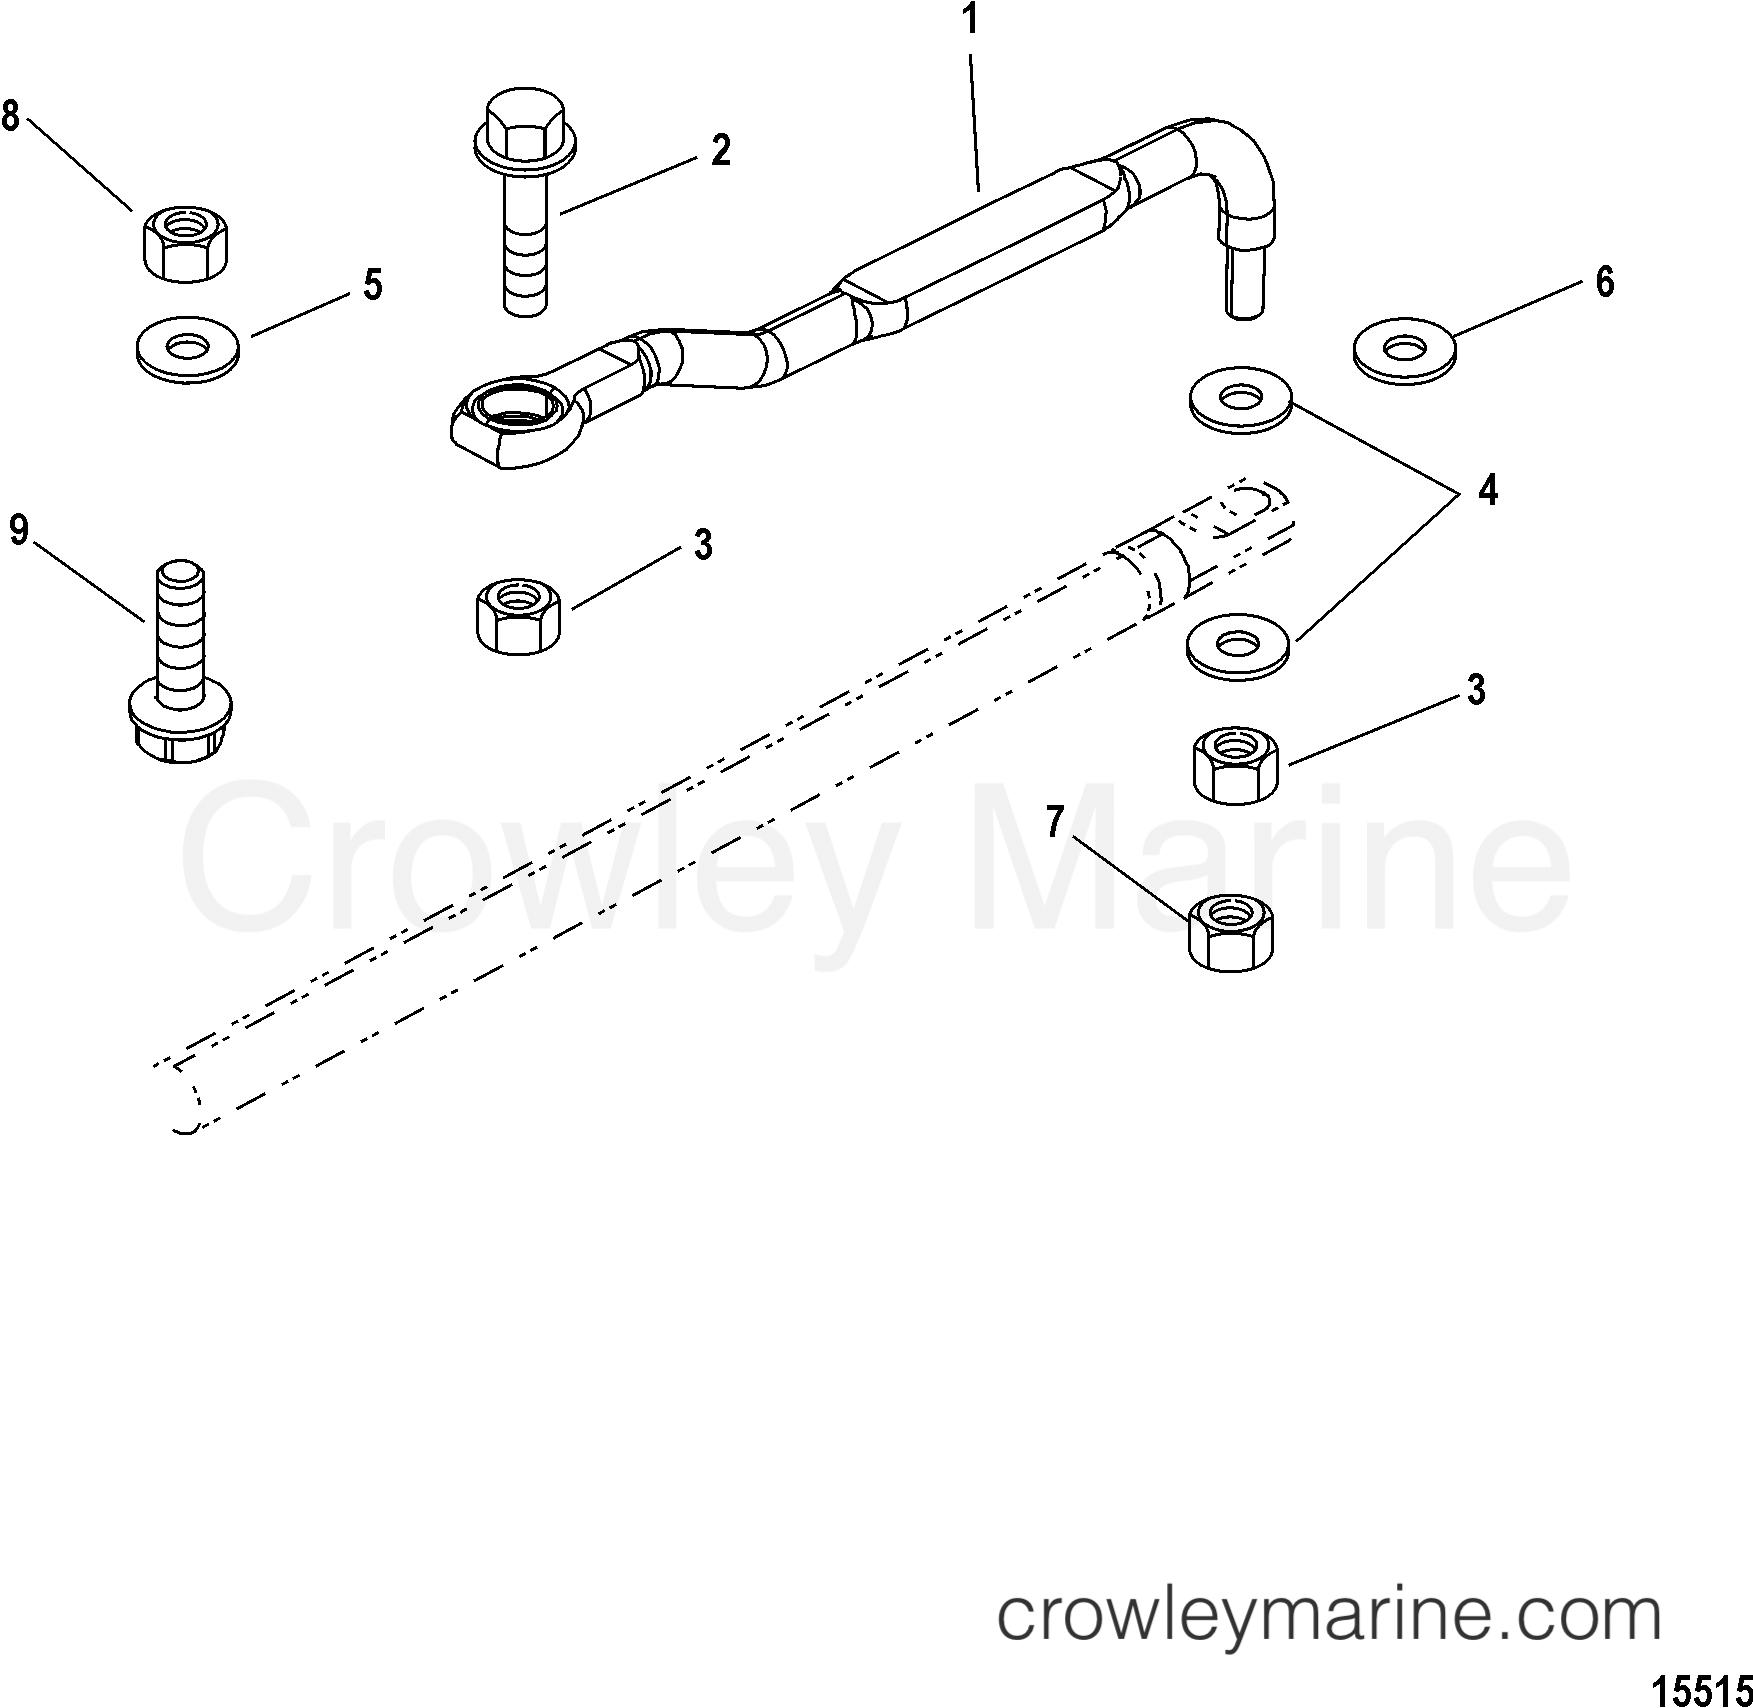 2010 Vw Jetta Air Conditioning Wiring Diagram. Diagram